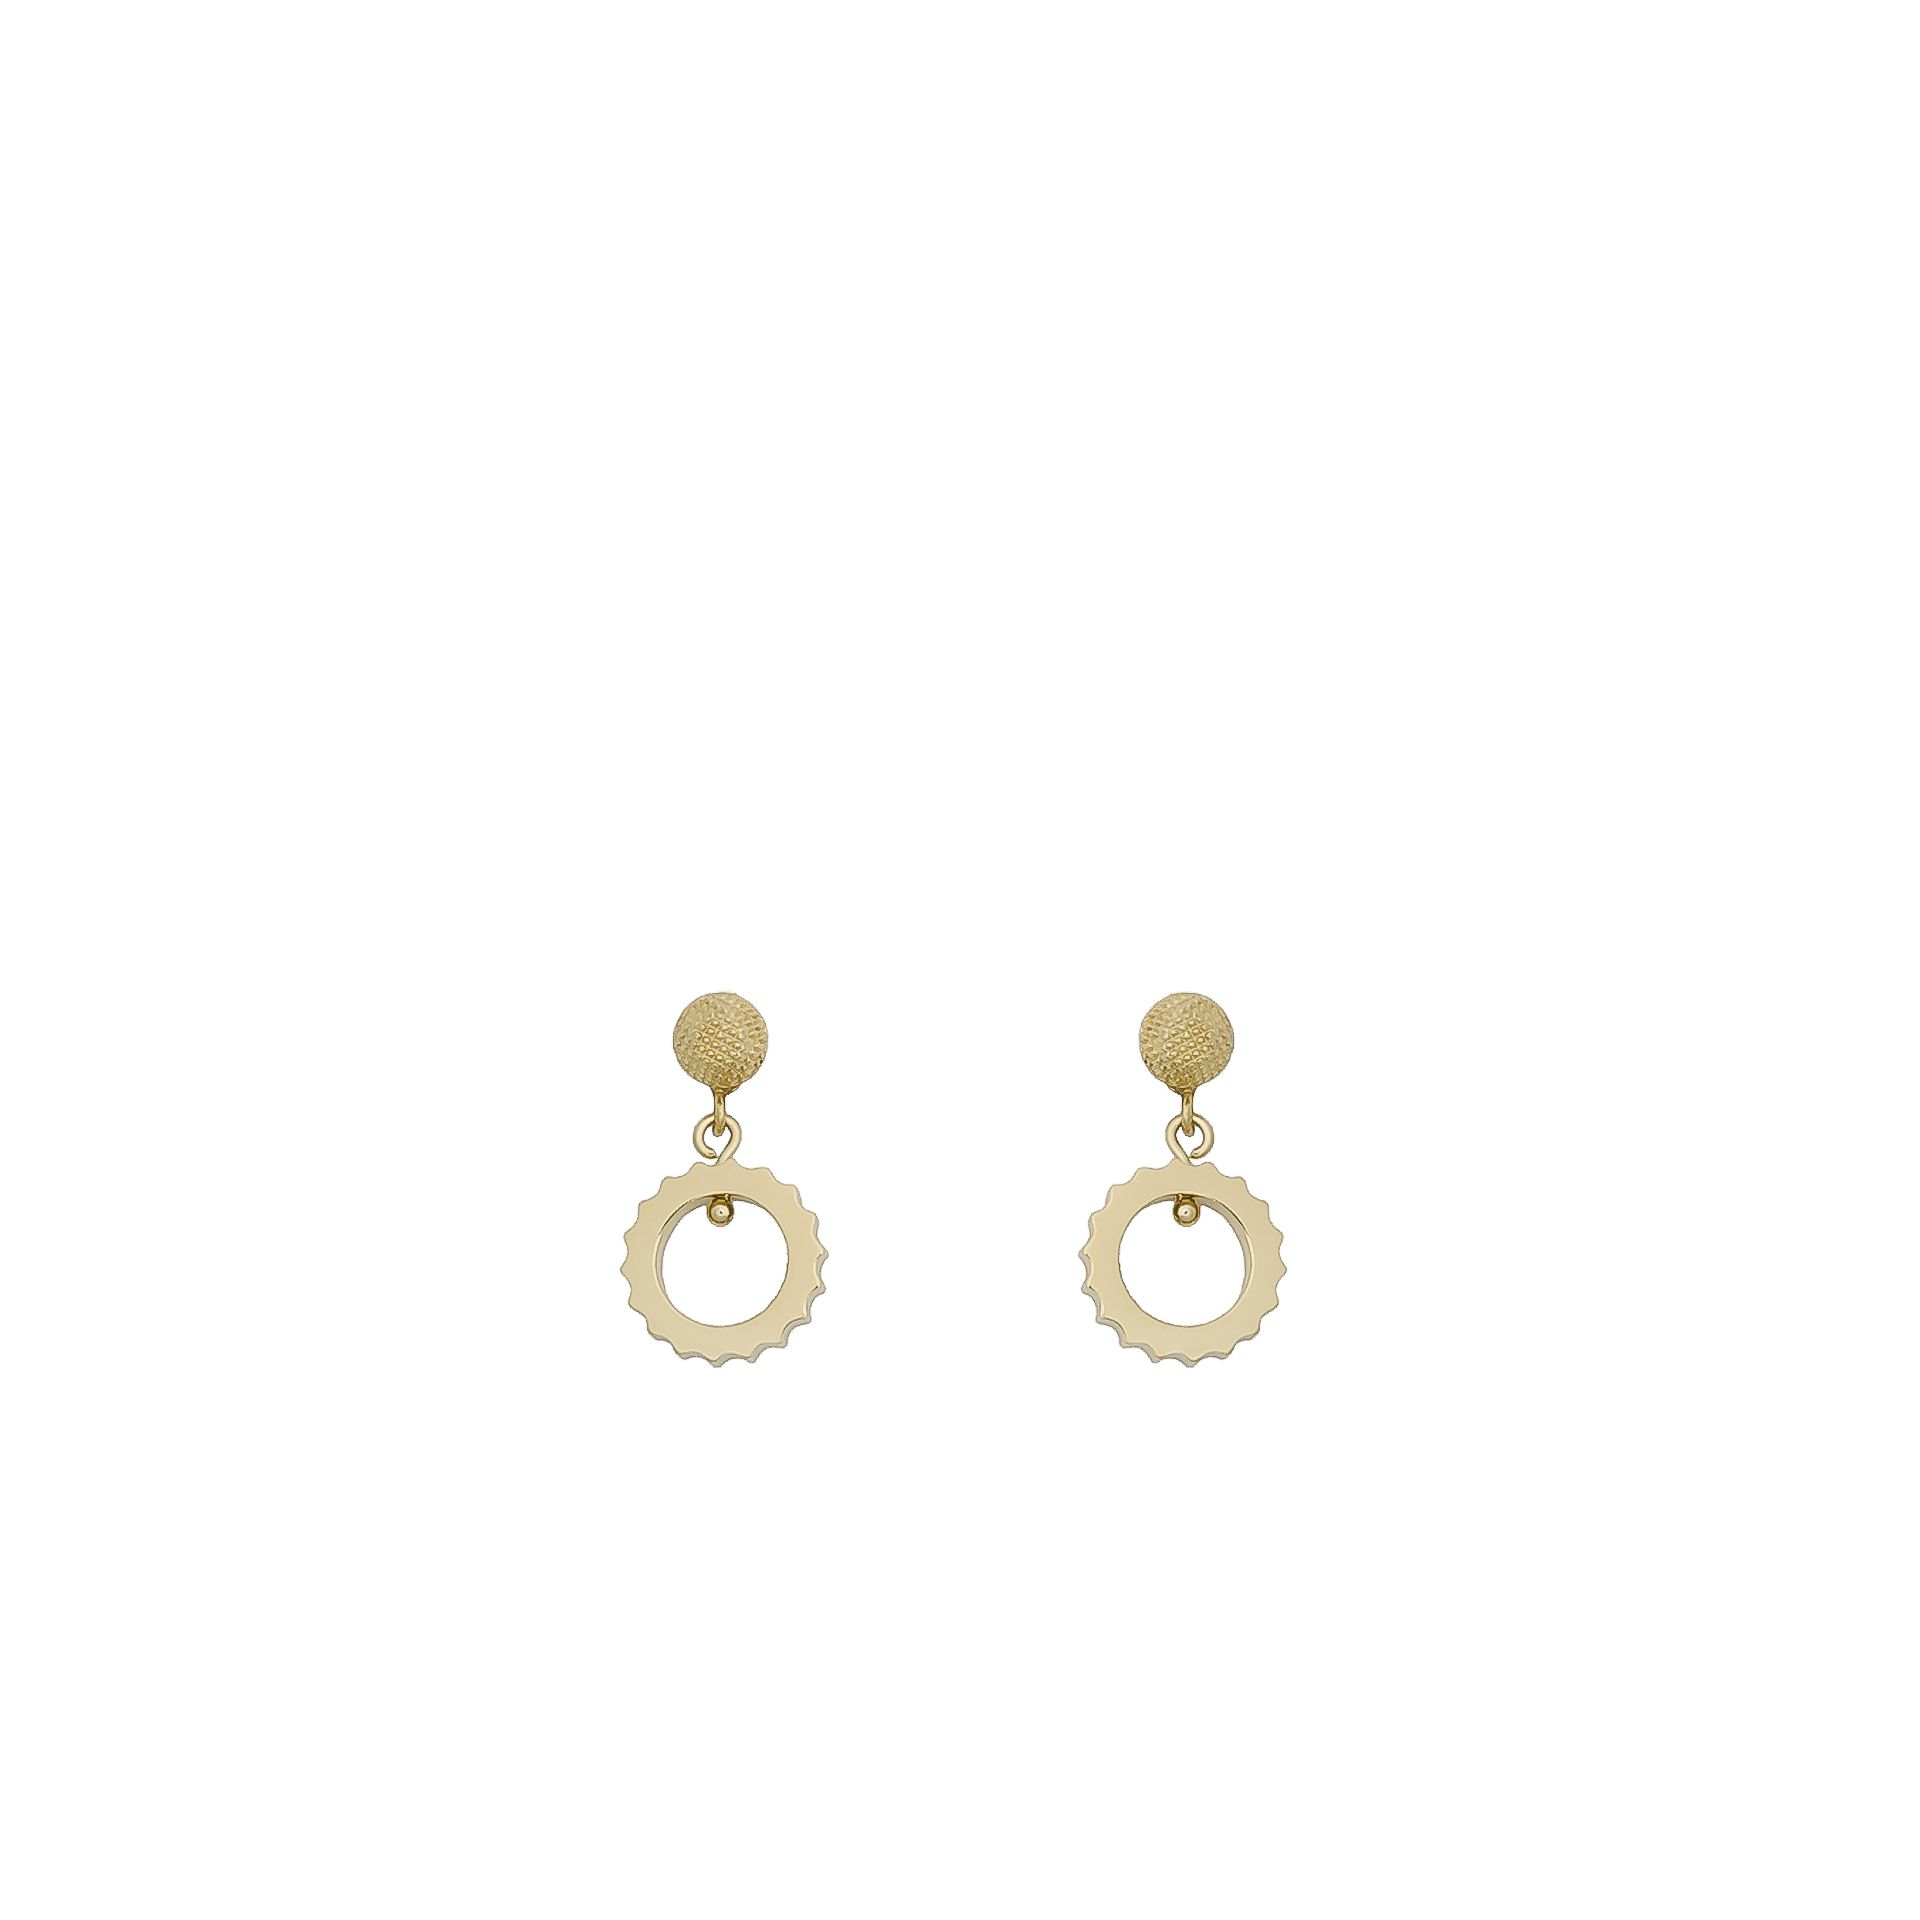 BALENCIAGA Balenciaga Boucles D'Oreilles Clip Classiques Boucles d'oreilles D f